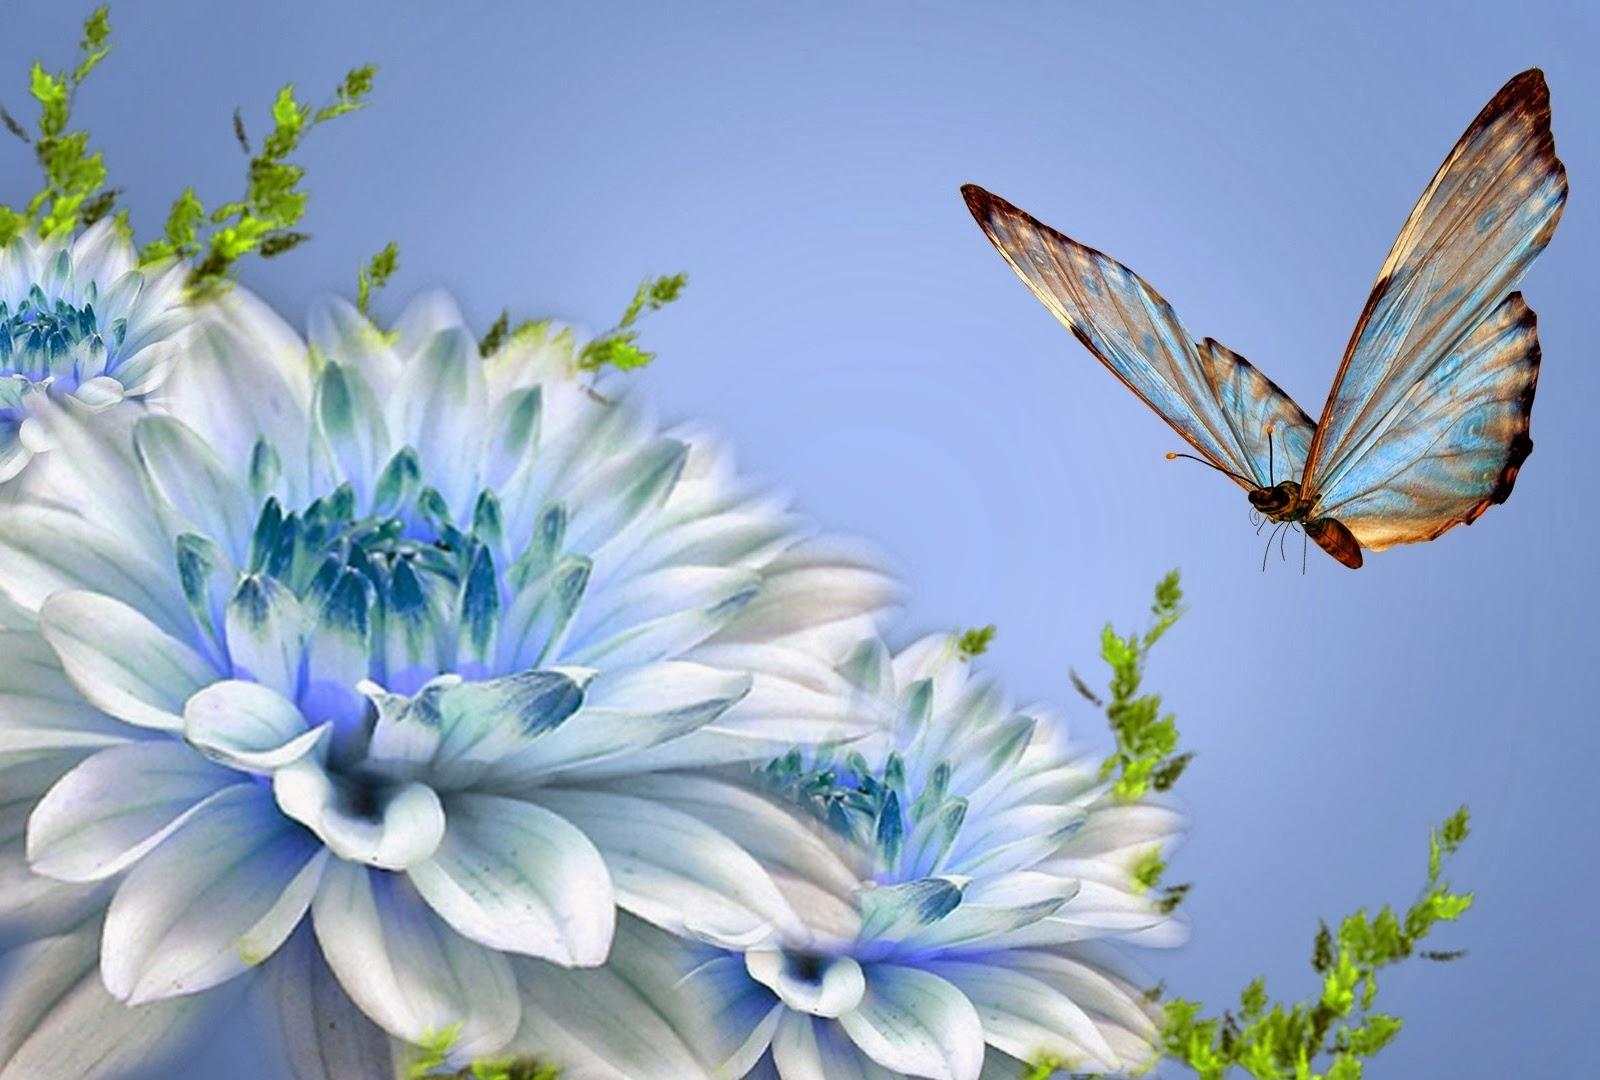 wallpaper islamic informatin site: nature wallpaper for desktop